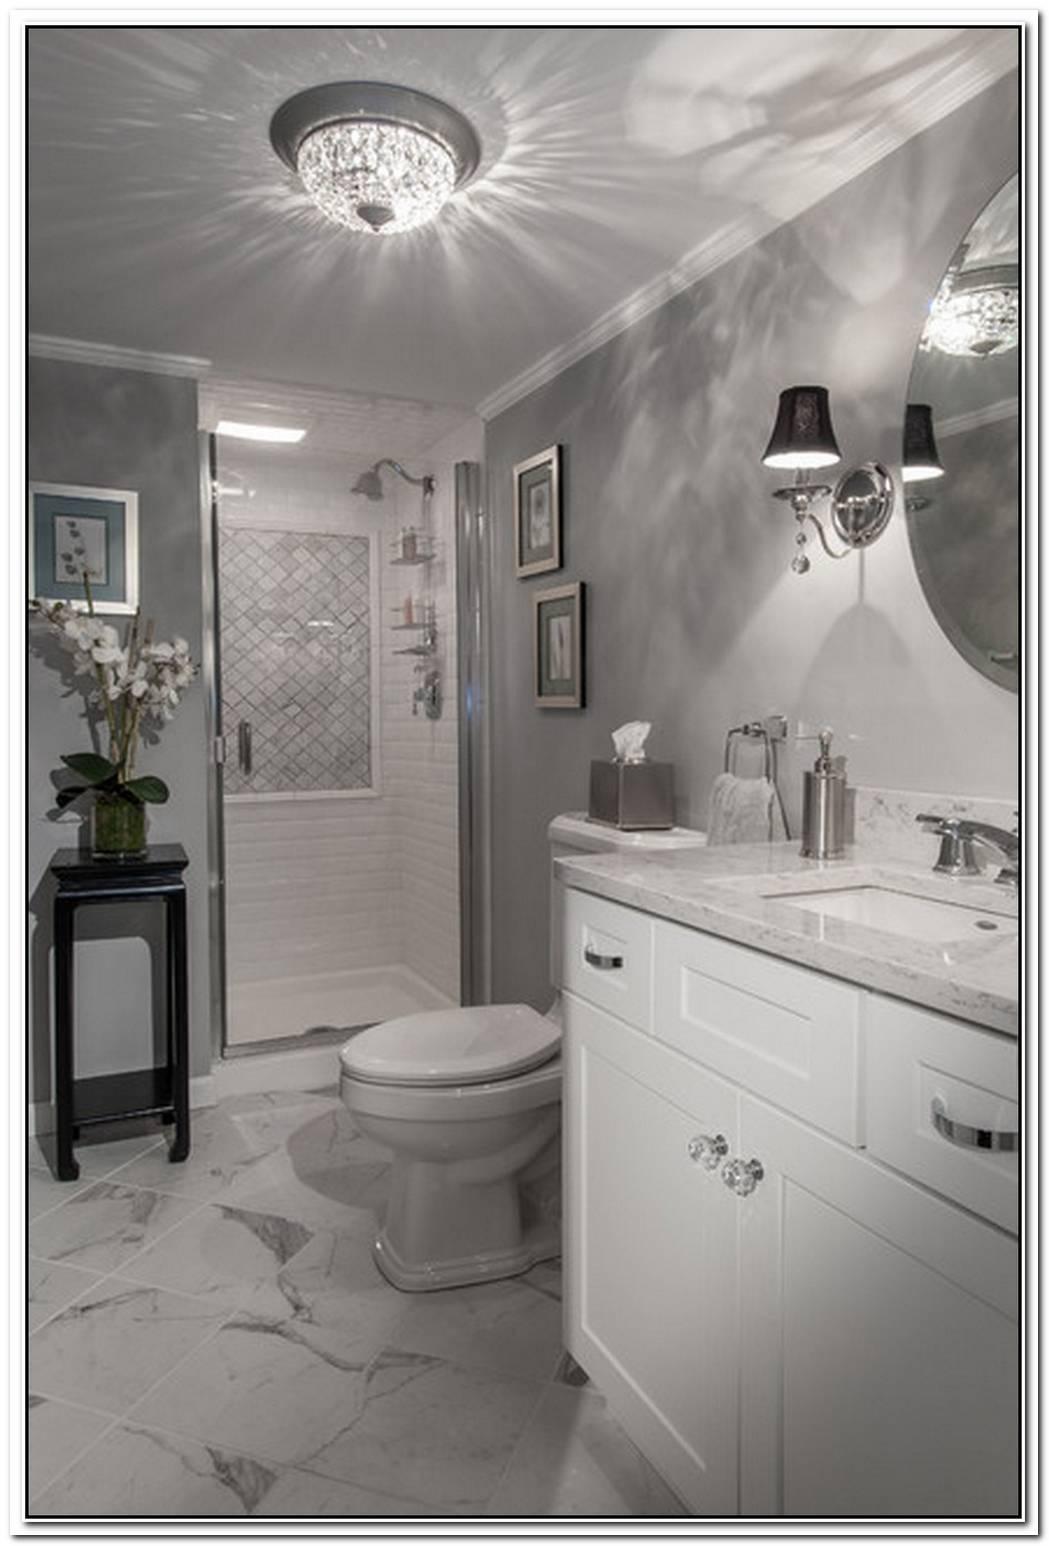 Glam Art Bathroom